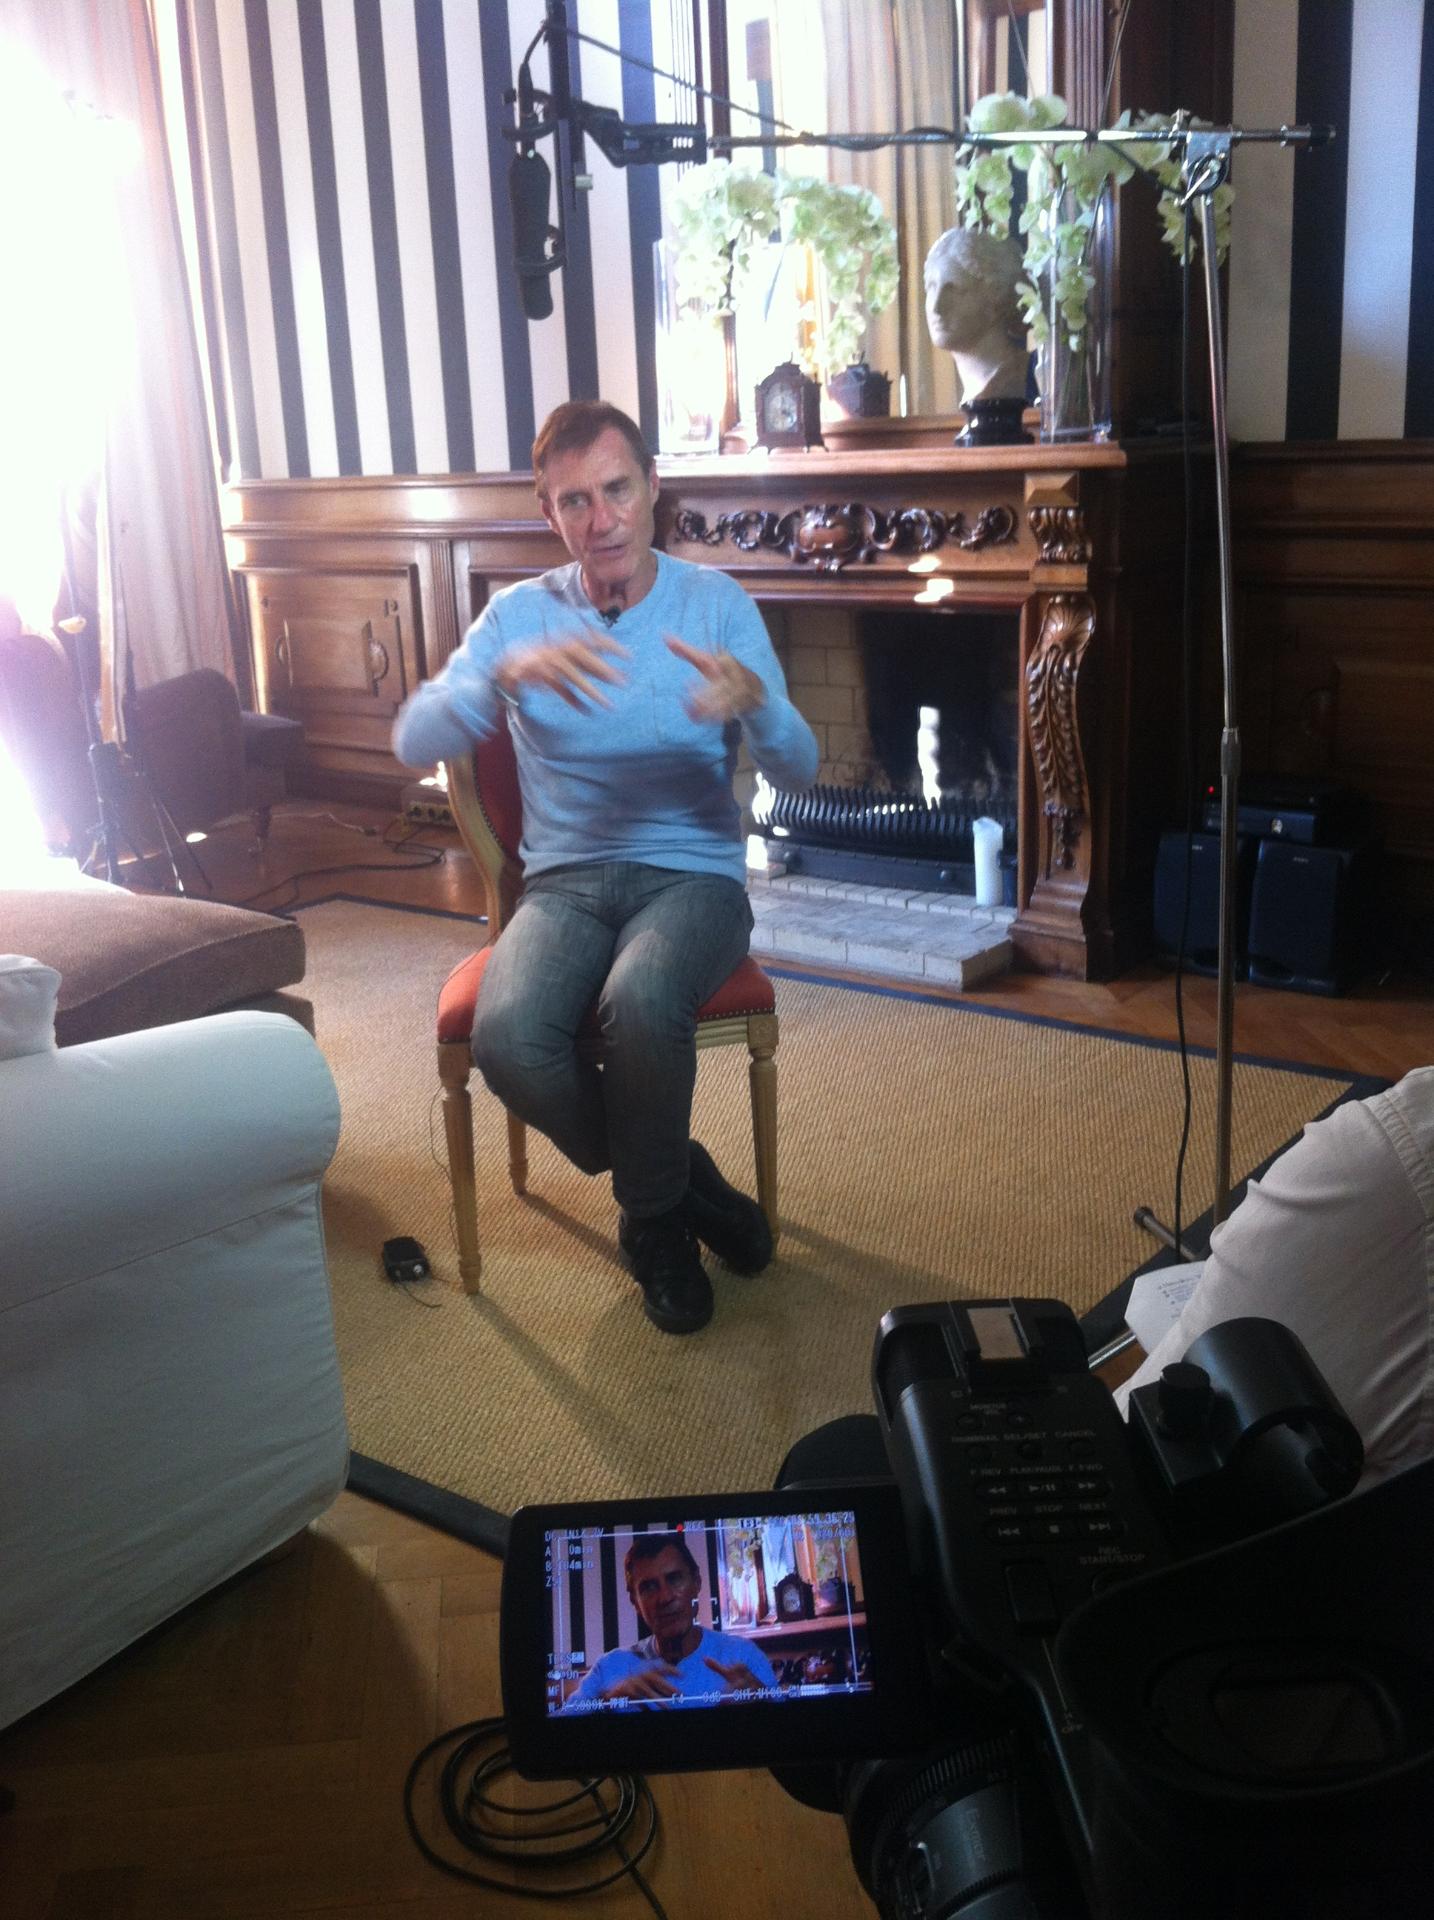 On location interviews